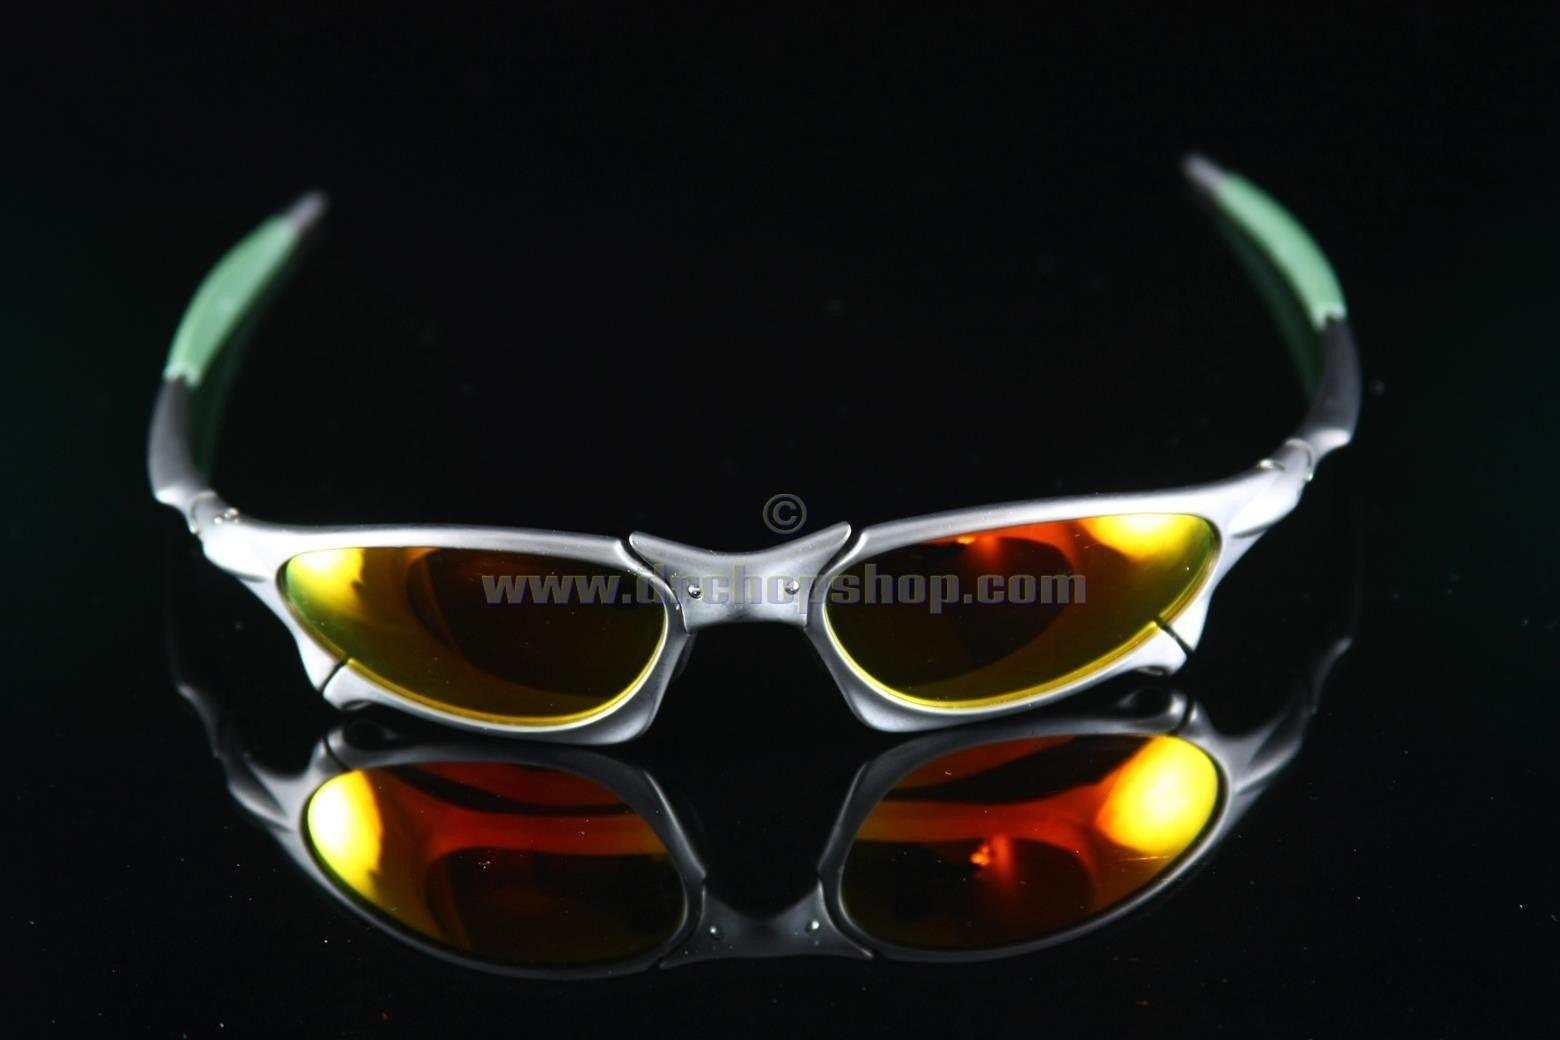 Custom X Metal Lenses Penny, XX, And Juliet - 892025_586284908049866_507514716_o.jpg